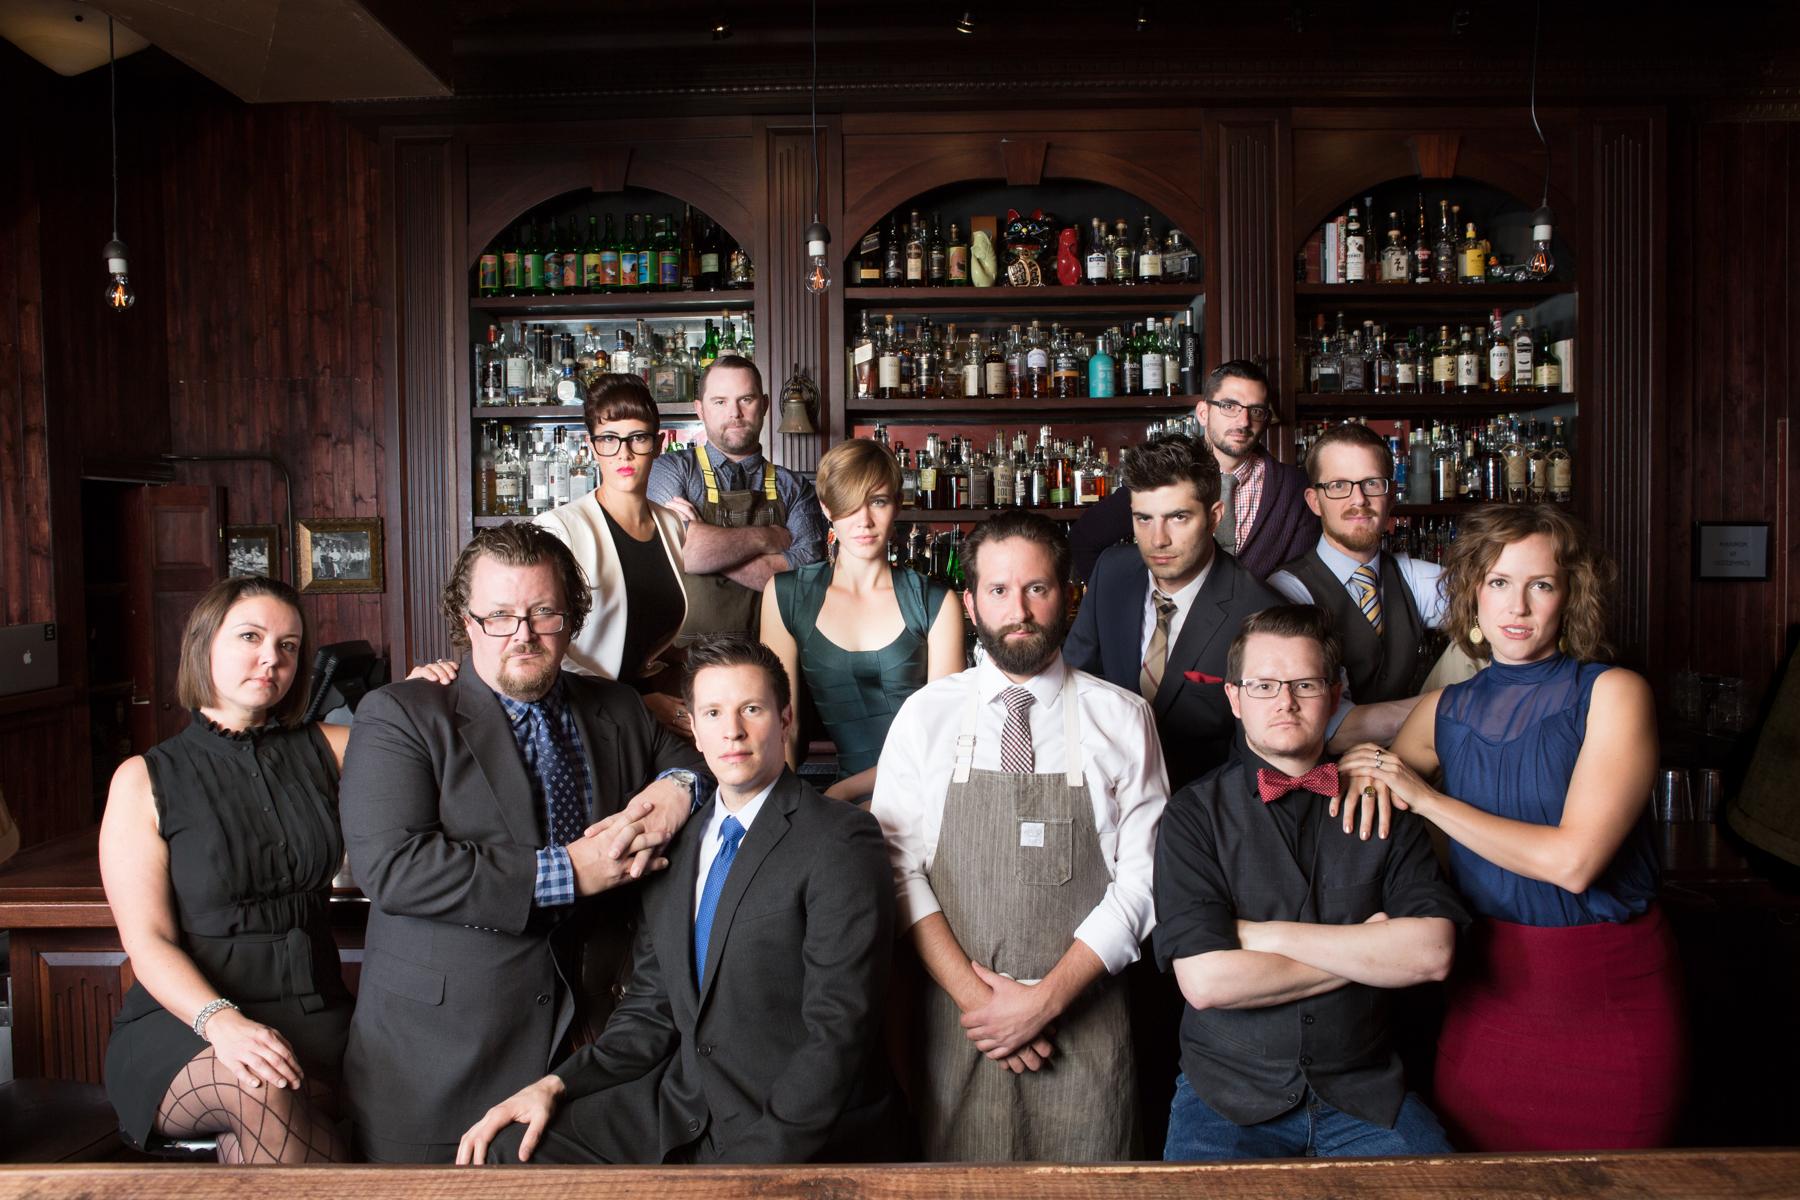 Denver's Best Bartenders Class of 2015